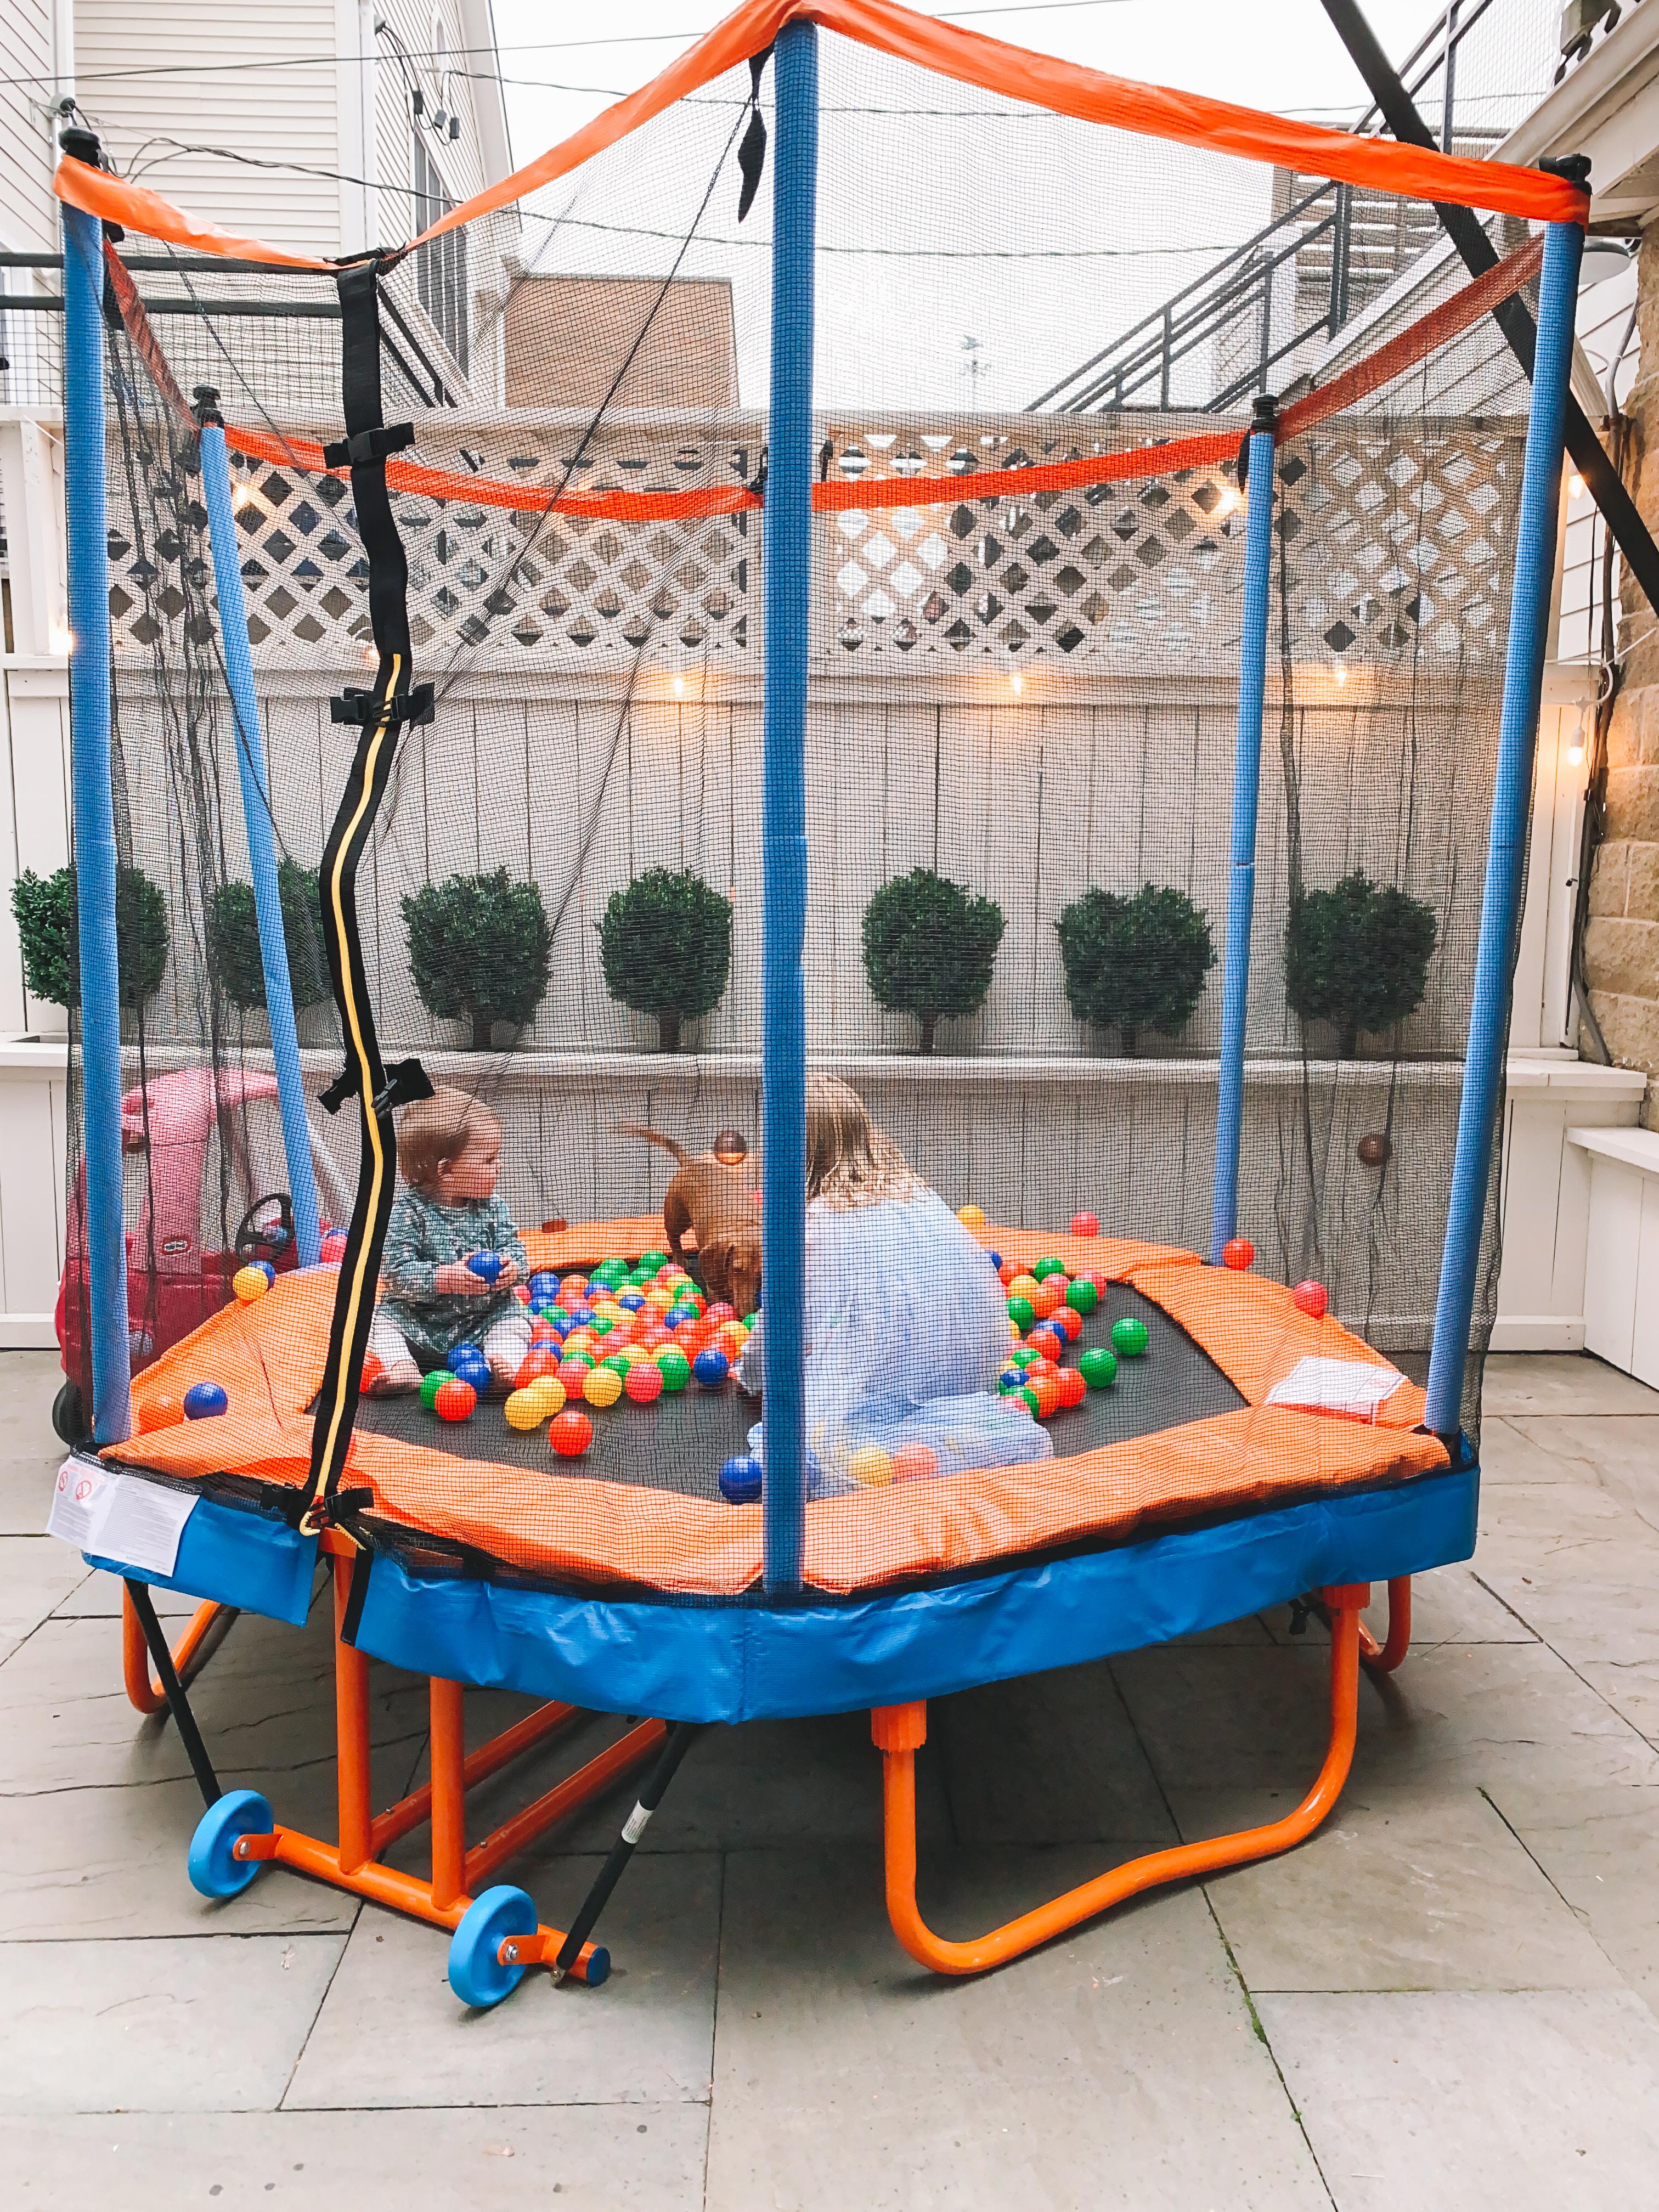 Kids On A Folding Trampoline - Kelly in the City